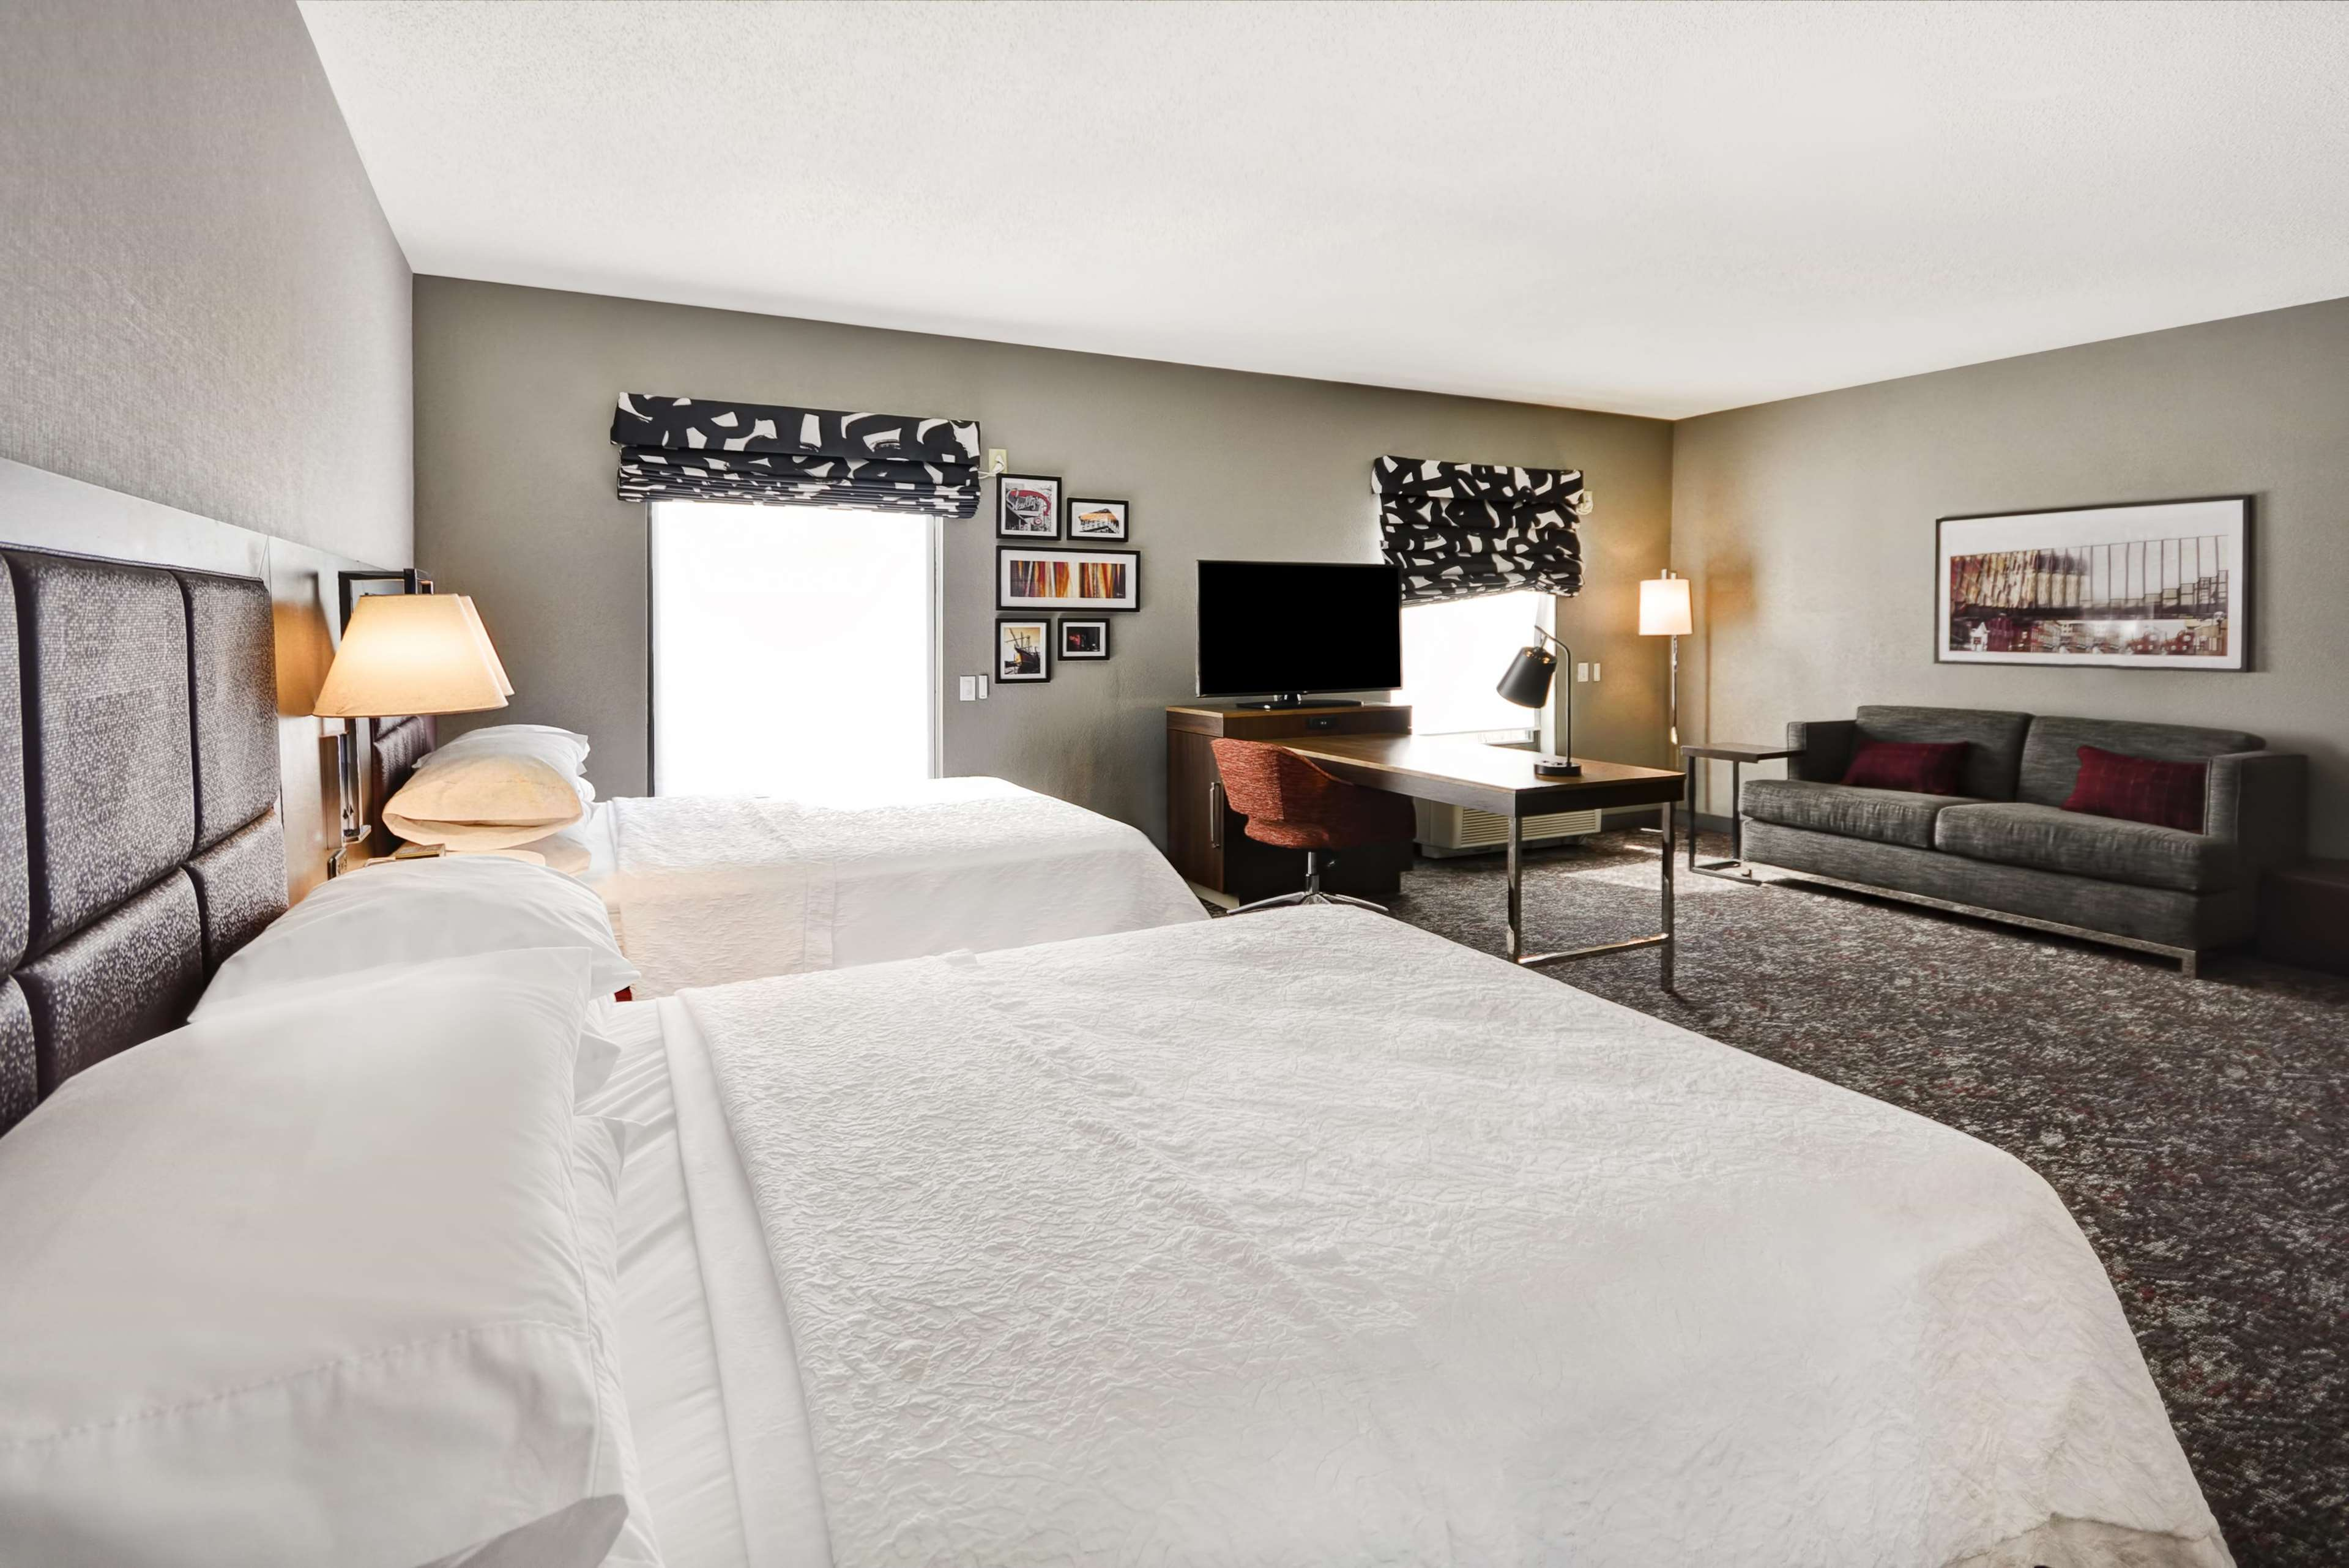 Hampton Inn & Suites Columbus-Easton Area image 51